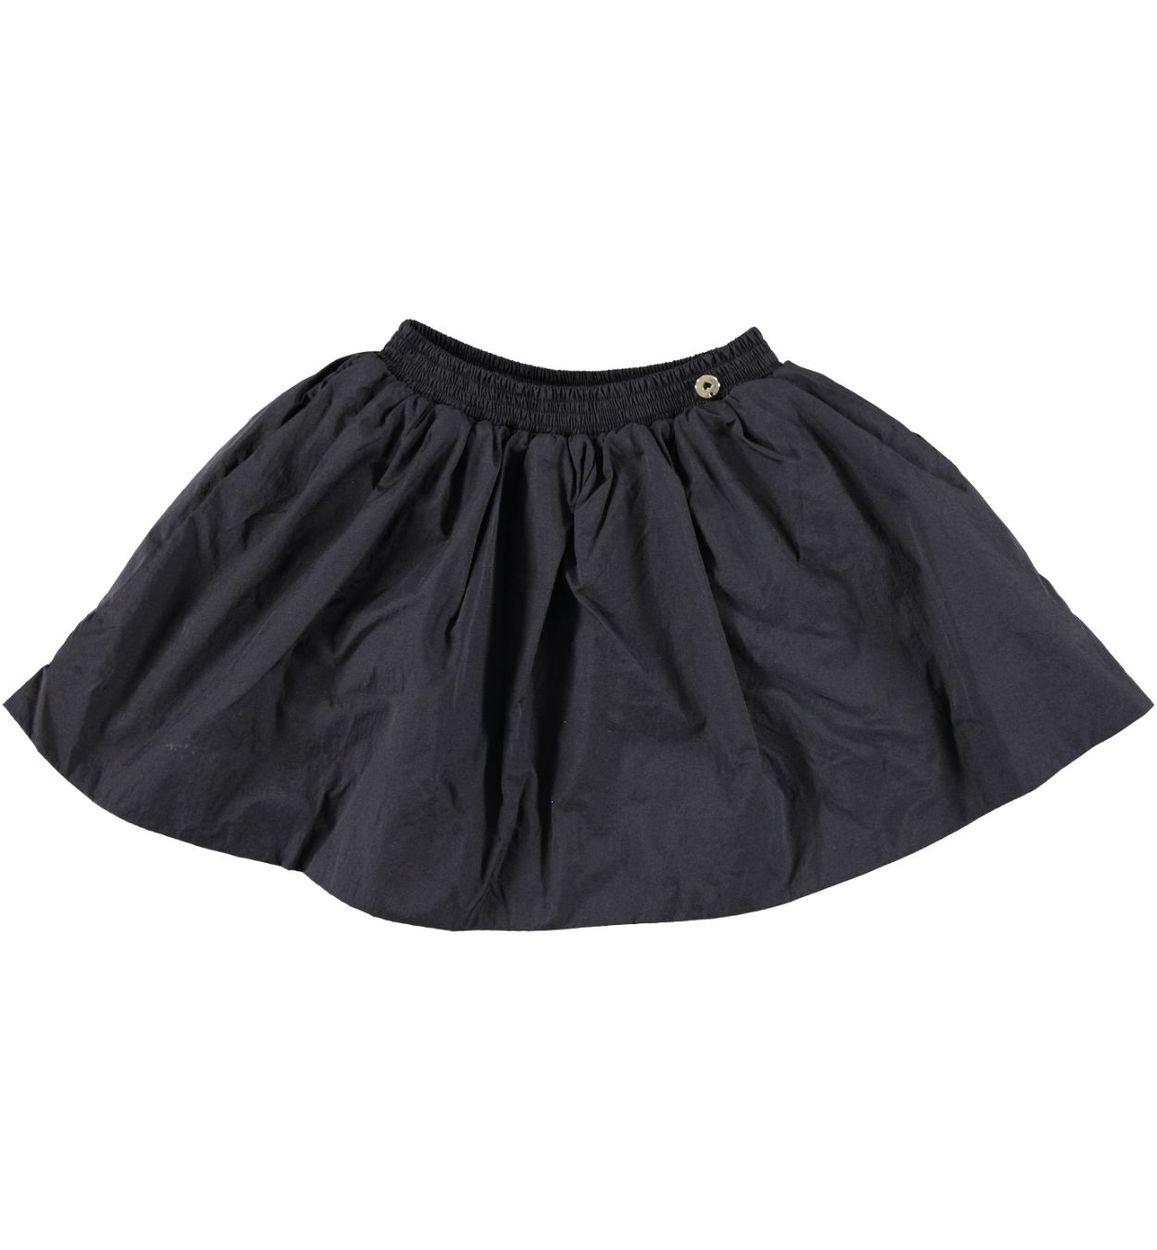 d22a33c8ae Elegante gonna a palloncino per bambina da 3 a 16 anni iDO